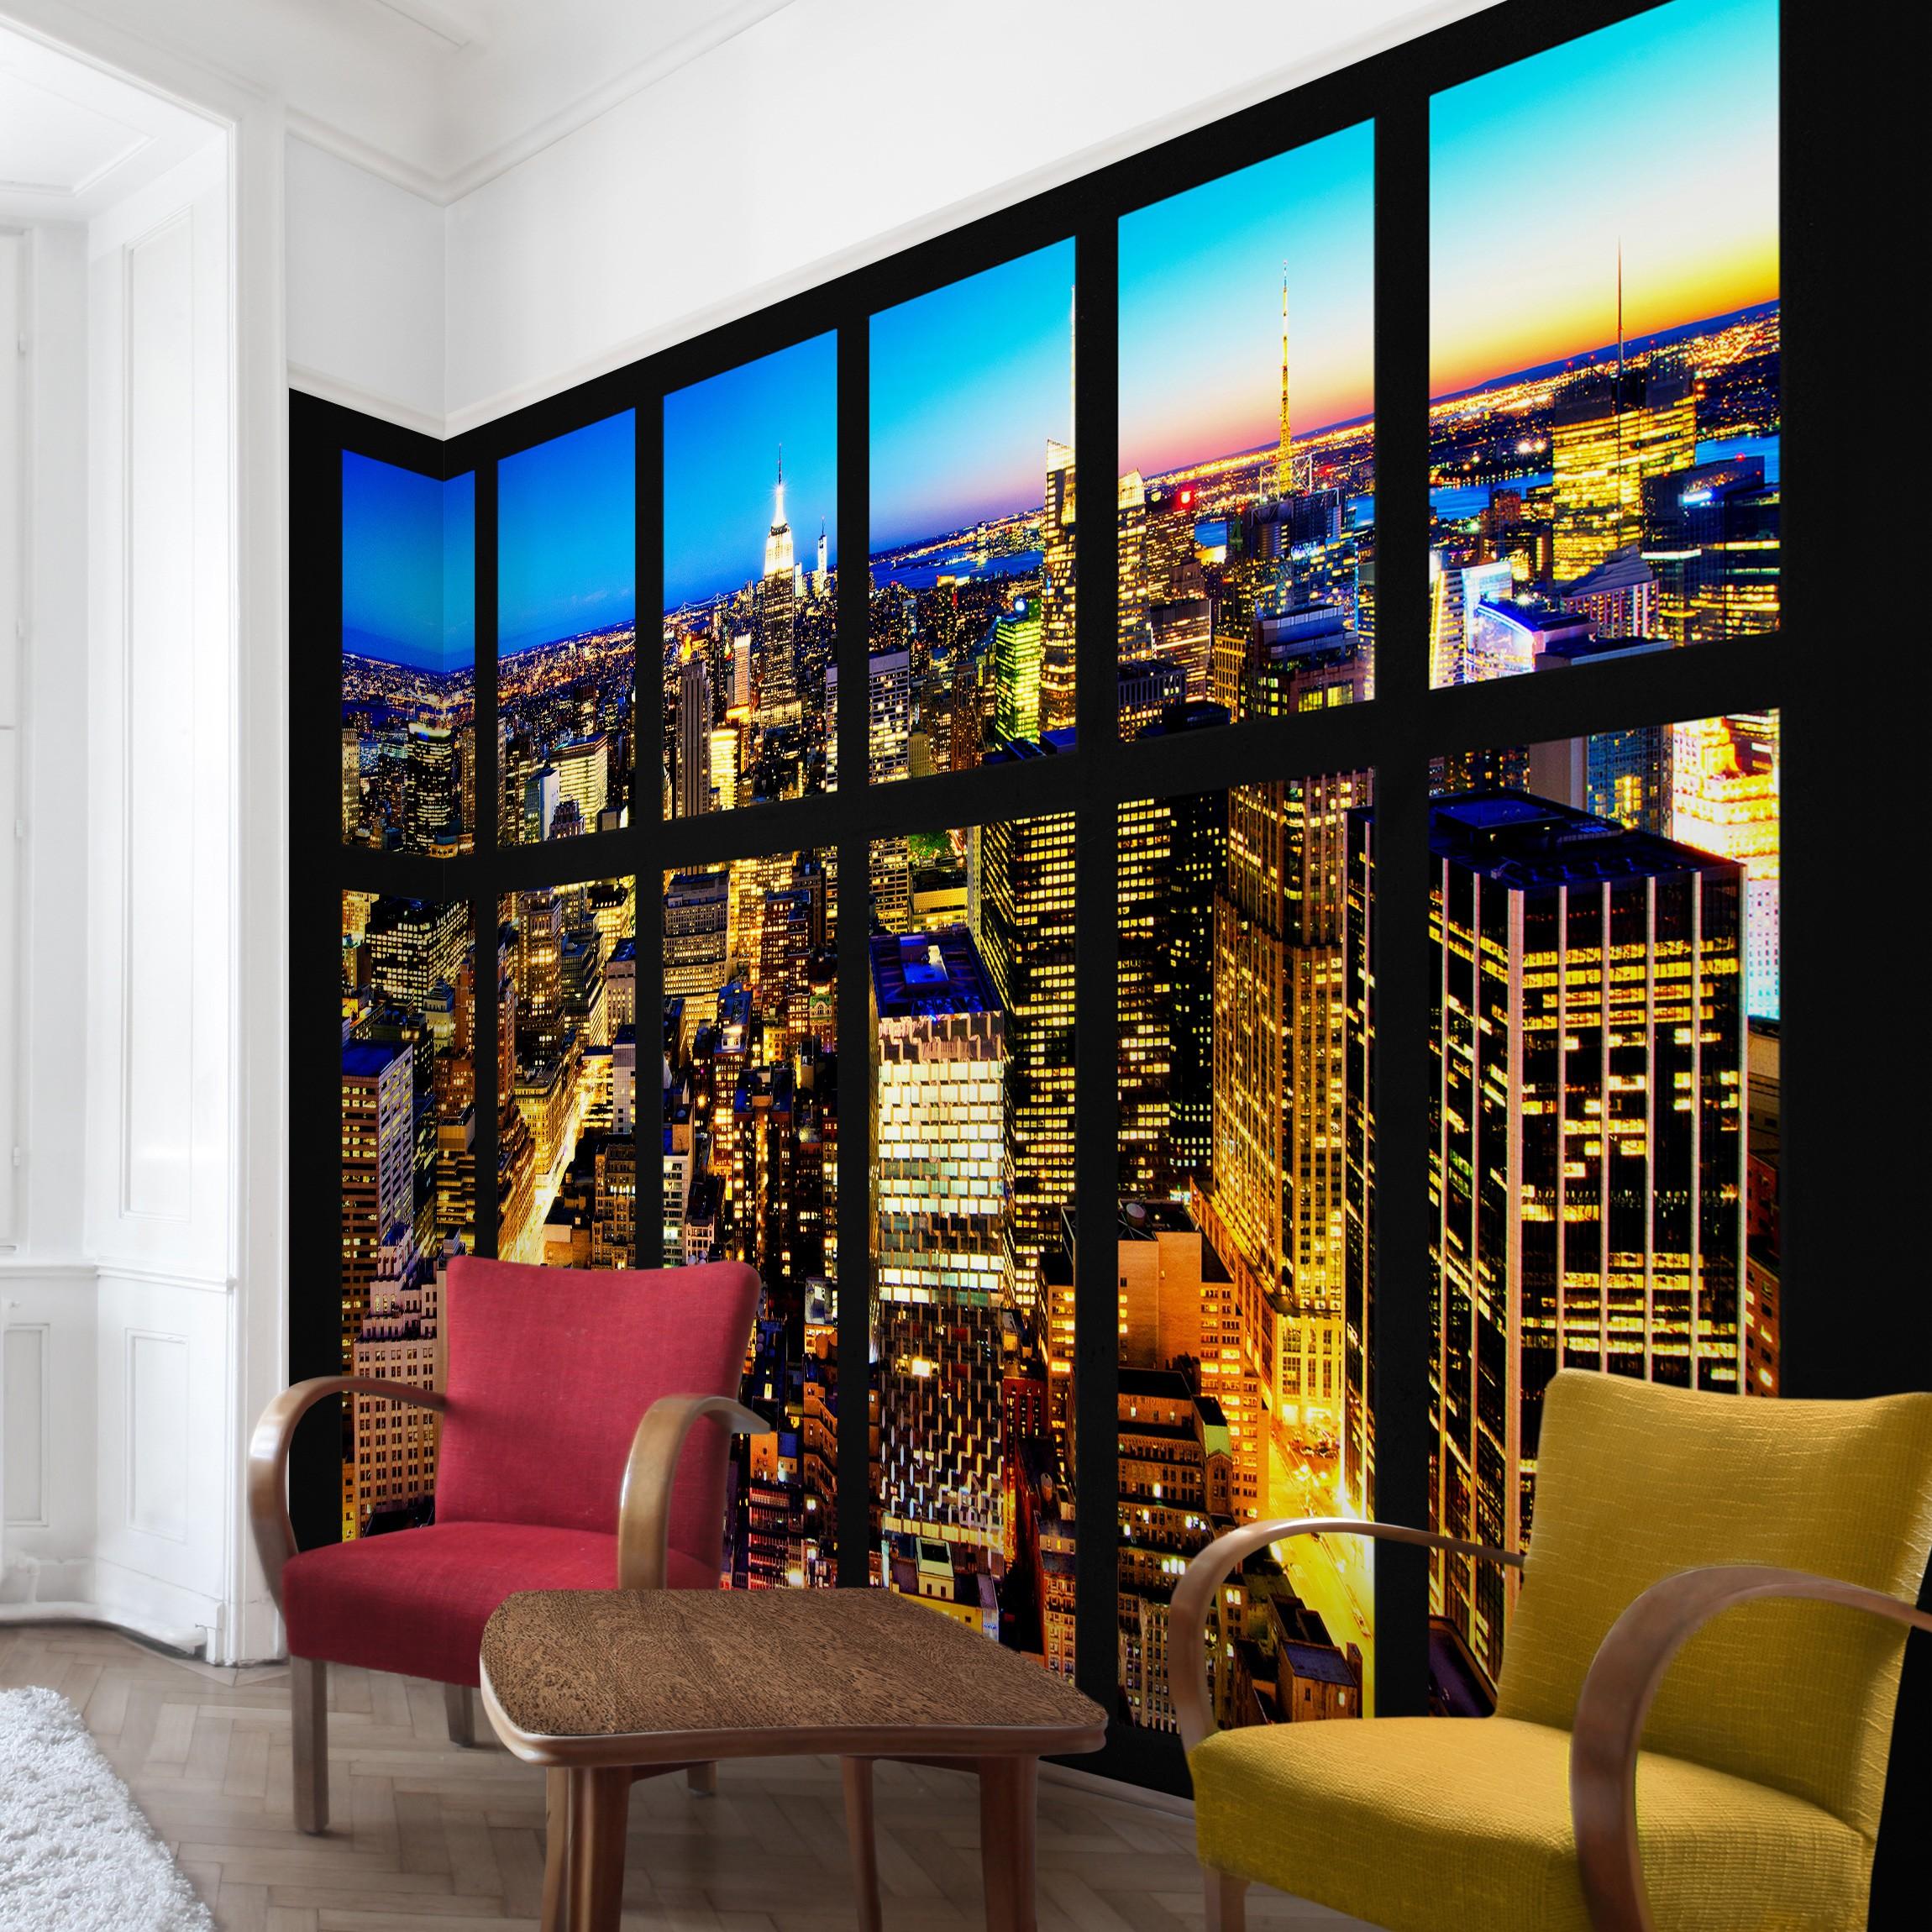 new york fototapete selbstklebend fensterblick manhattan skyline bei nacht. Black Bedroom Furniture Sets. Home Design Ideas